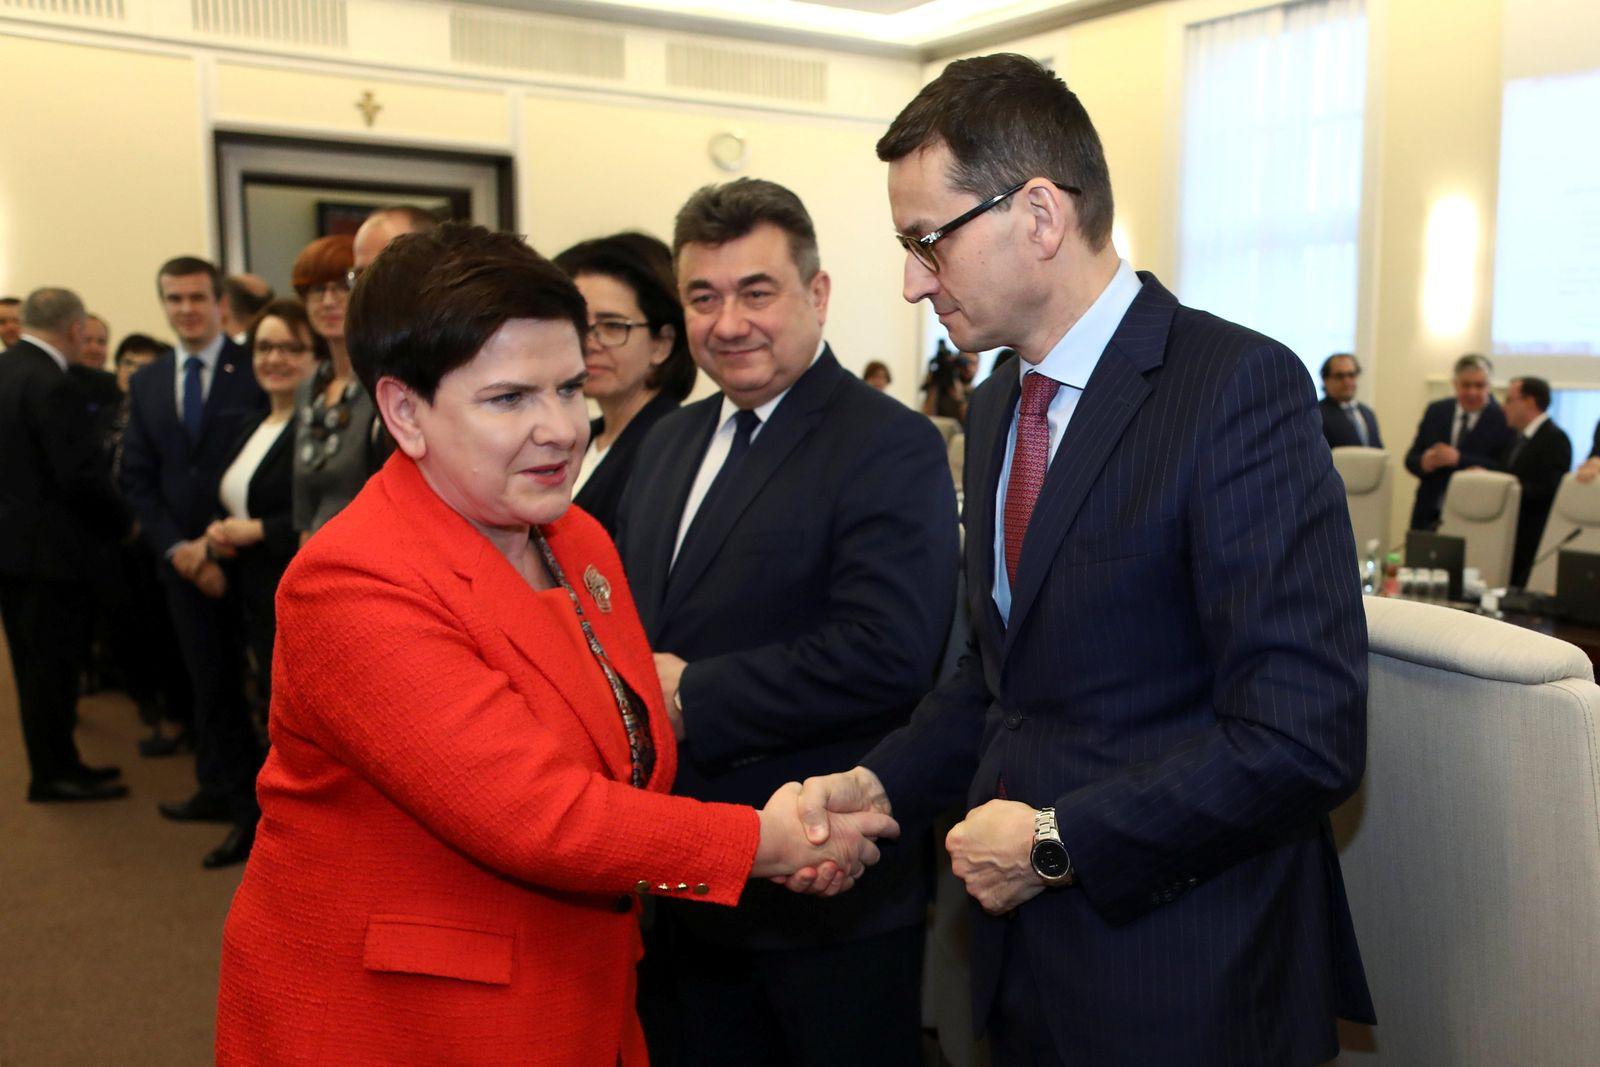 POLAND-POLITICS/GOVERNMENT